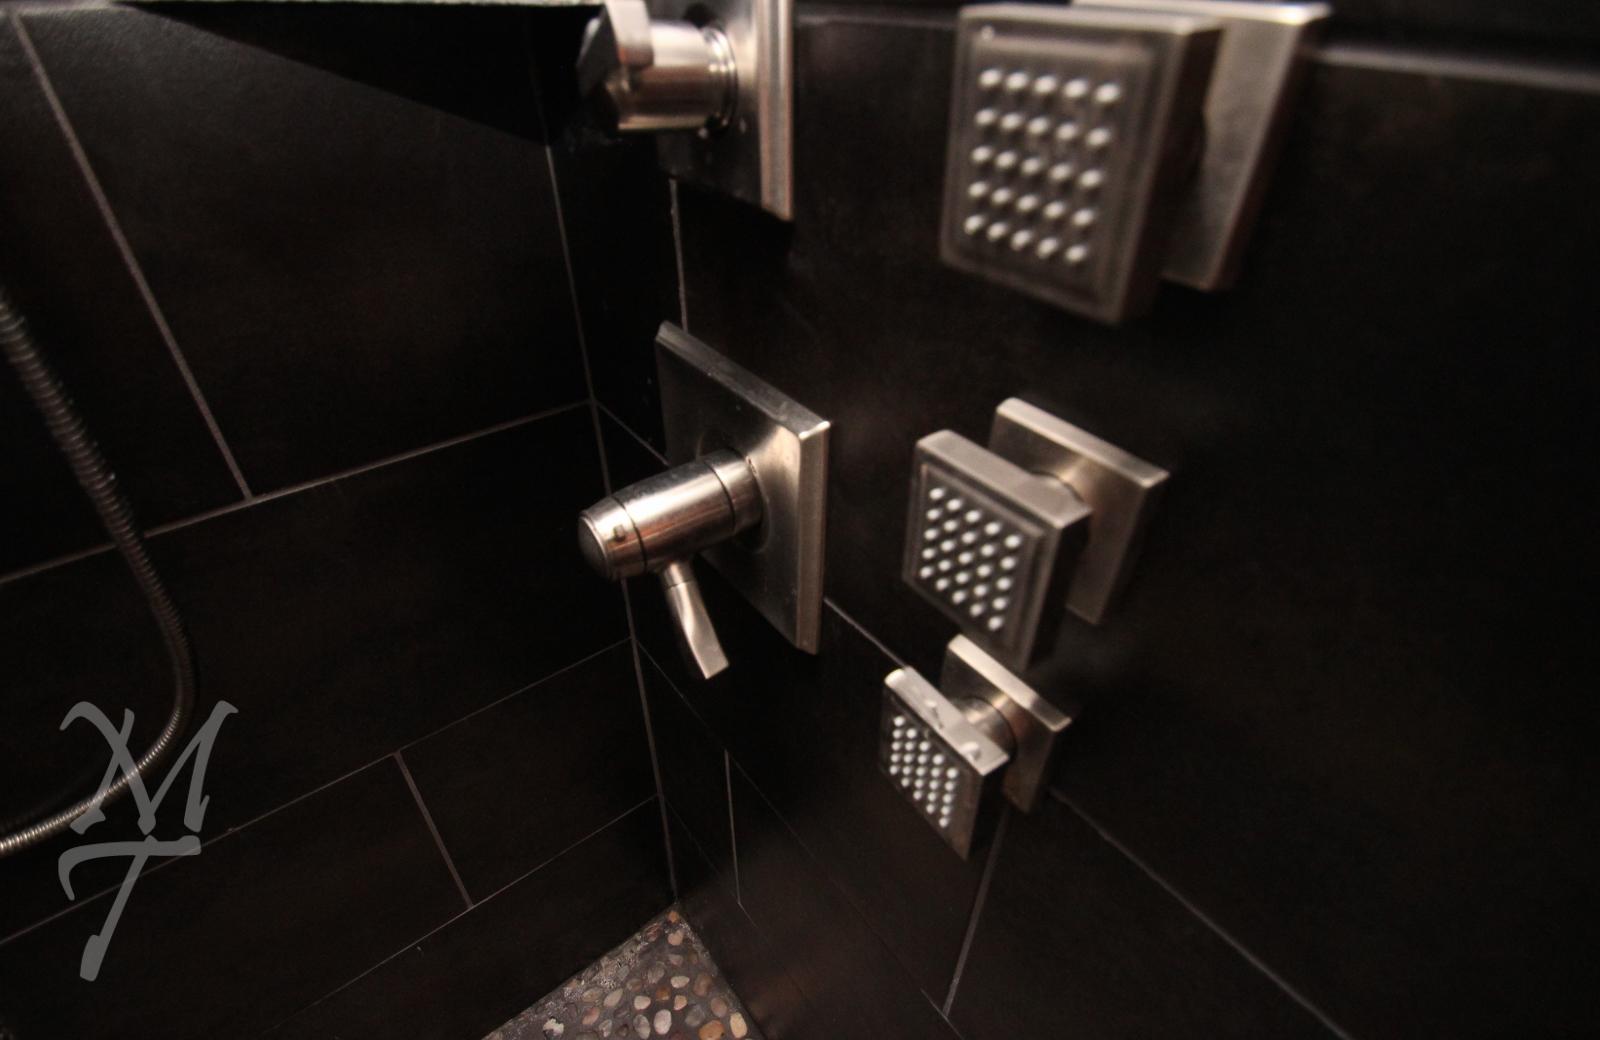 After_Bathroom_03A.jpg